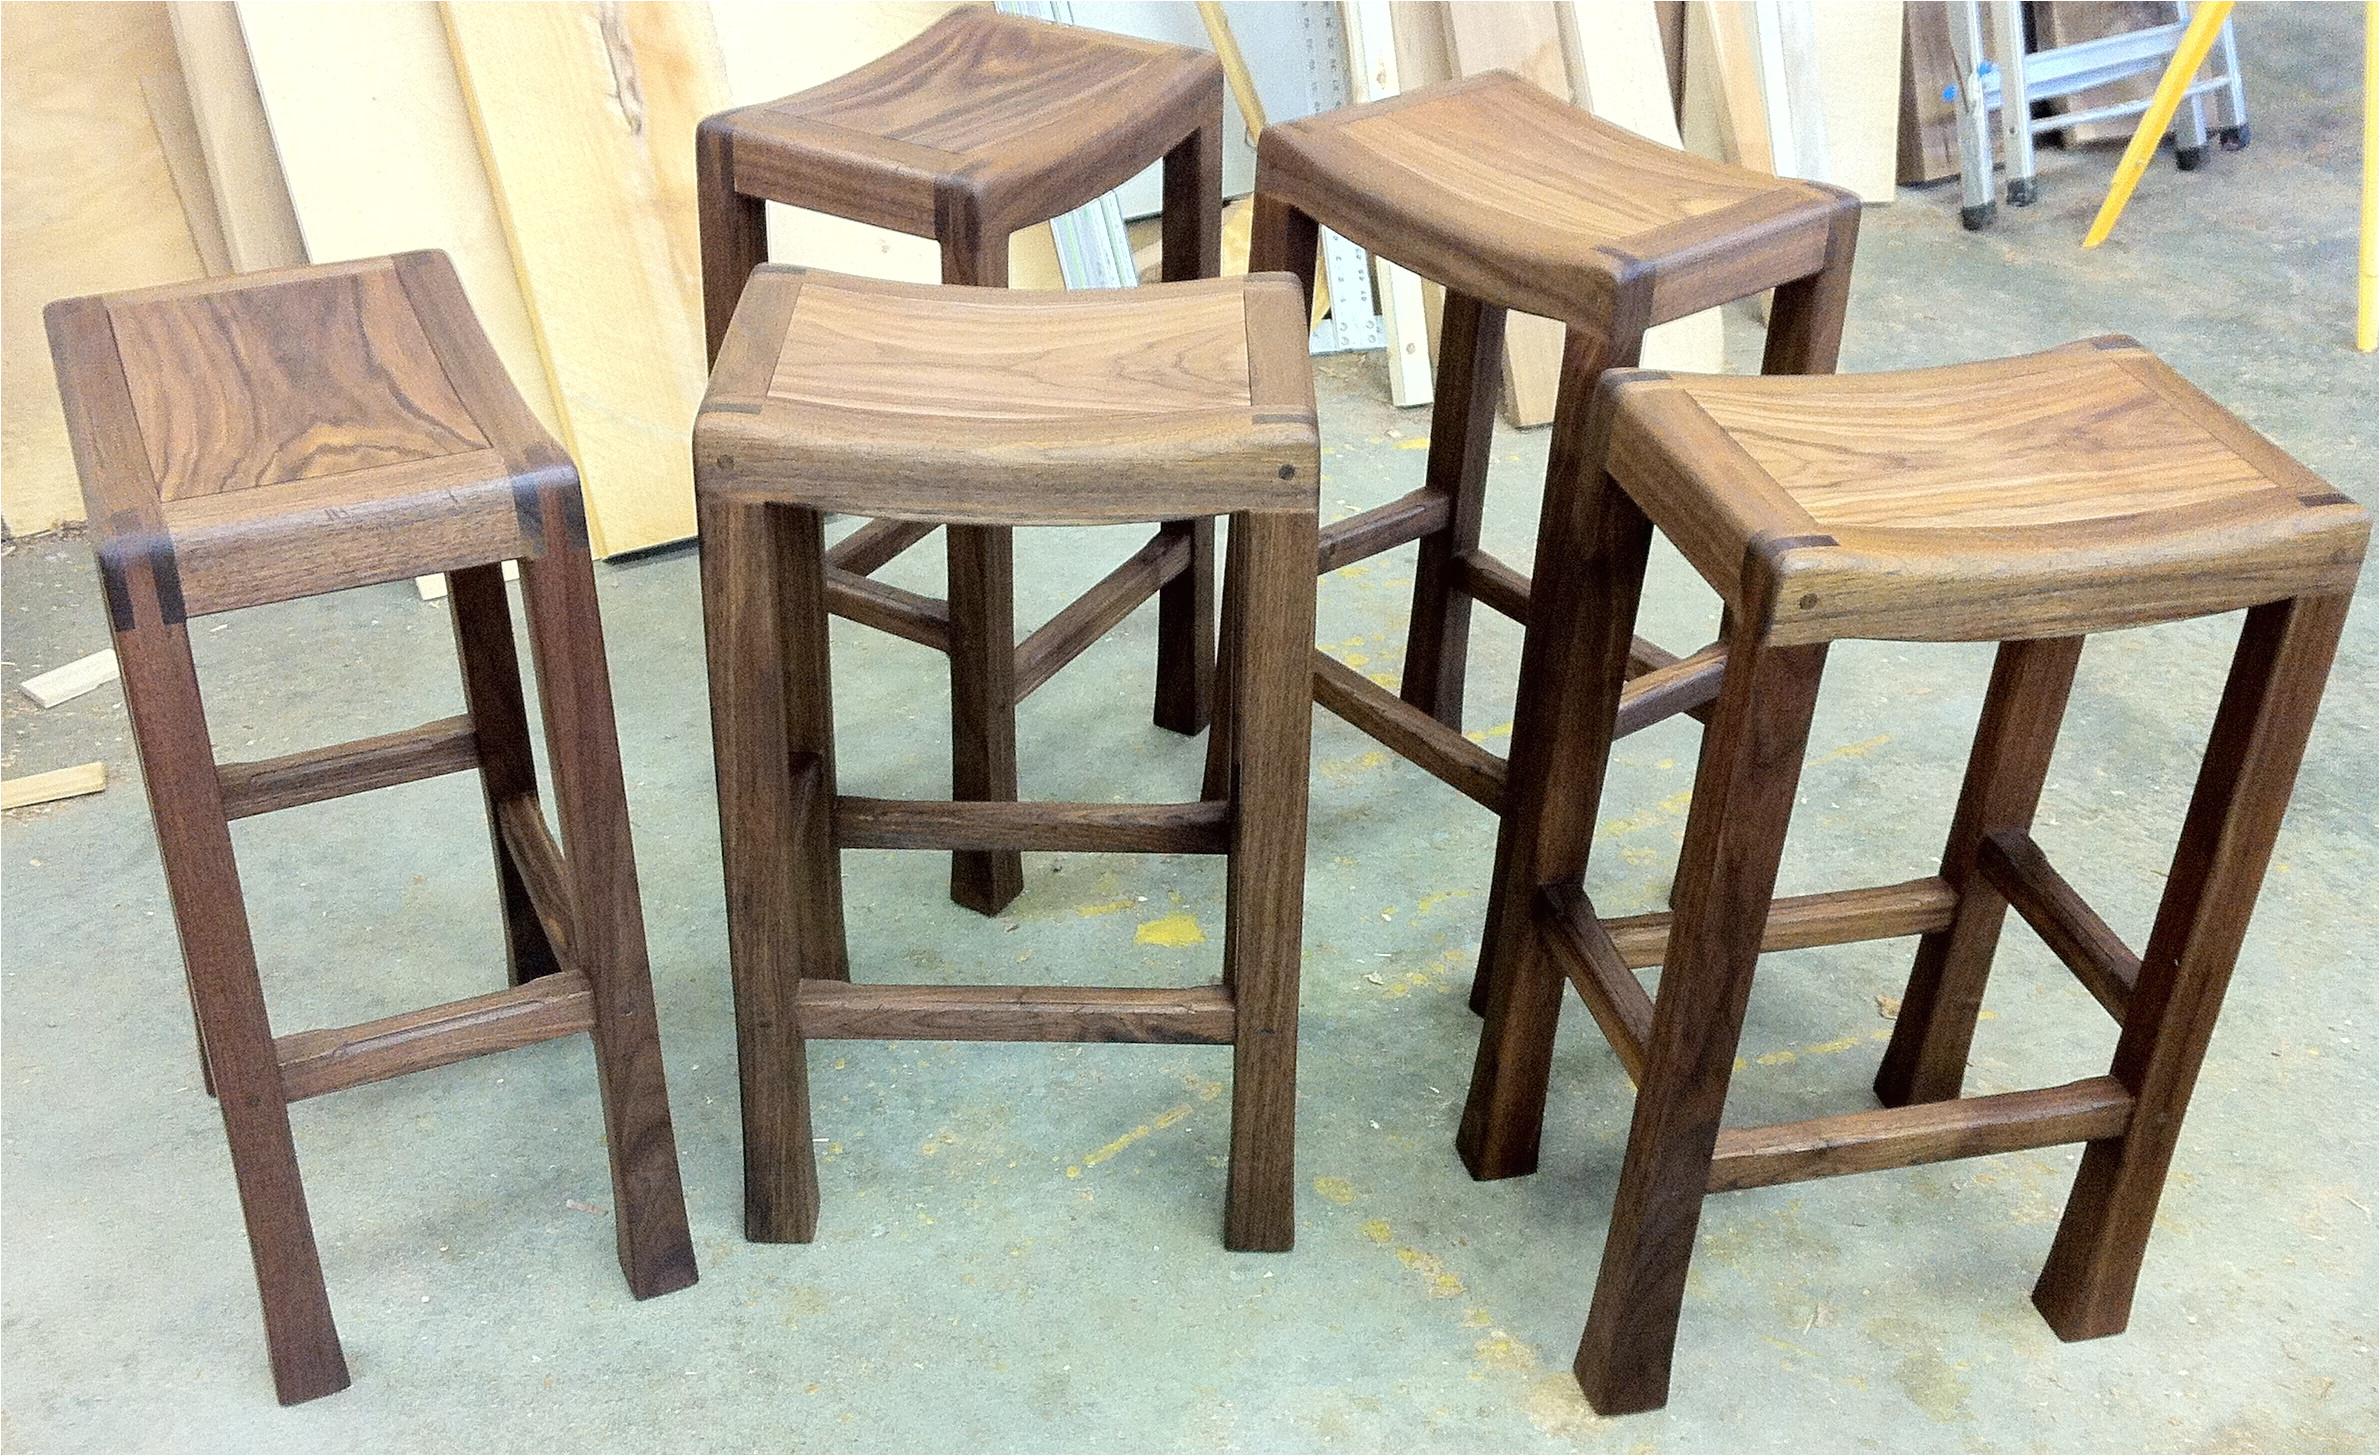 saddle seat bar stools 24 inch download full size of stool 93 striking wooden bar